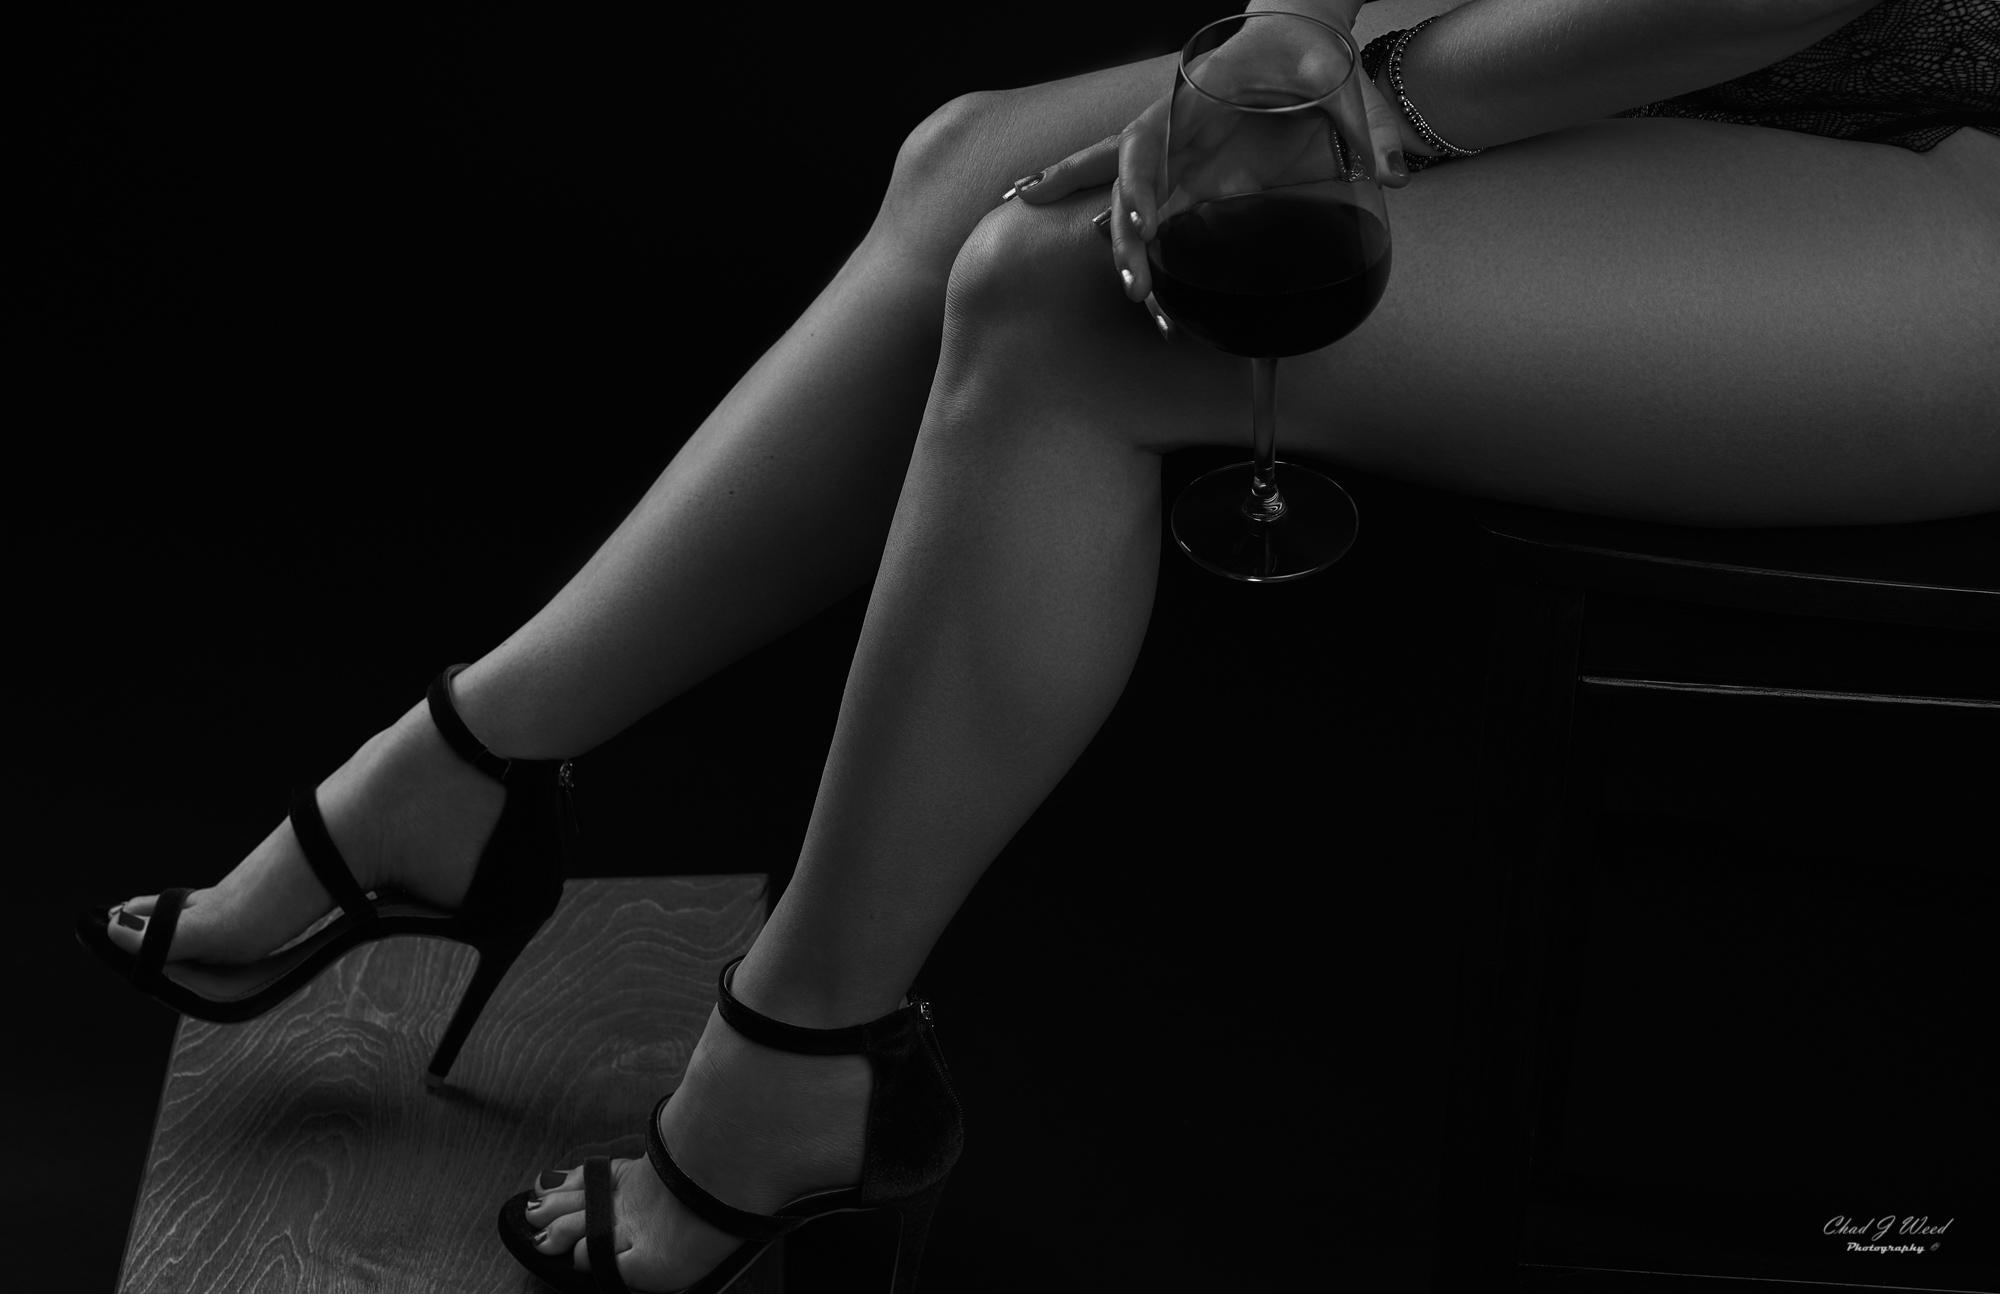 Kirsten Leg Model by Mesa Arizona Fashion Photographer Chad Weed